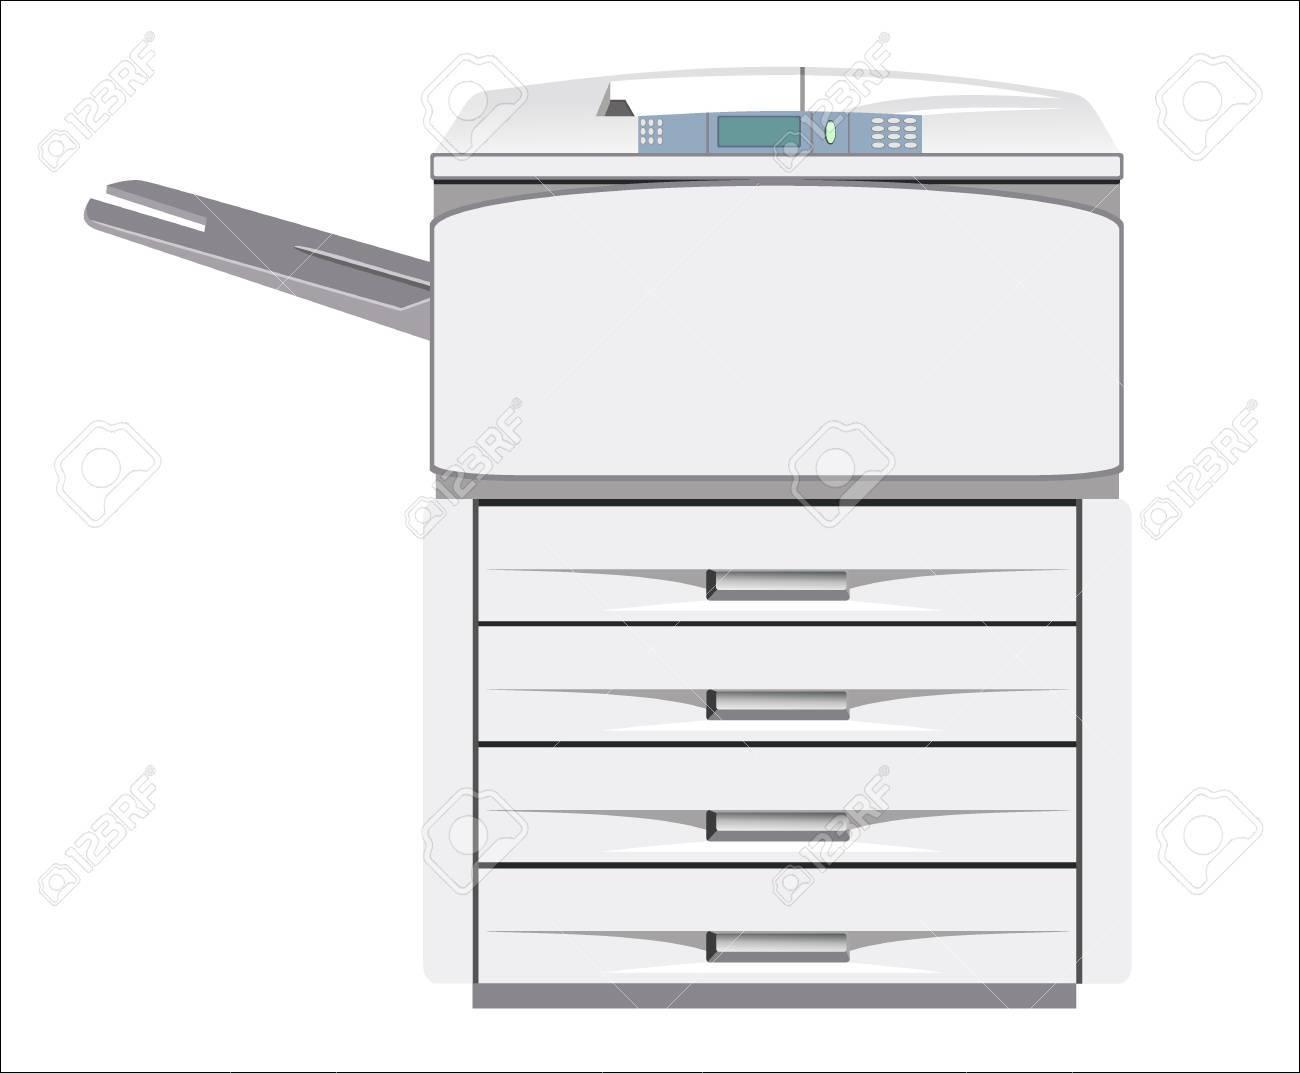 Grey computer printer isolated - 18463395